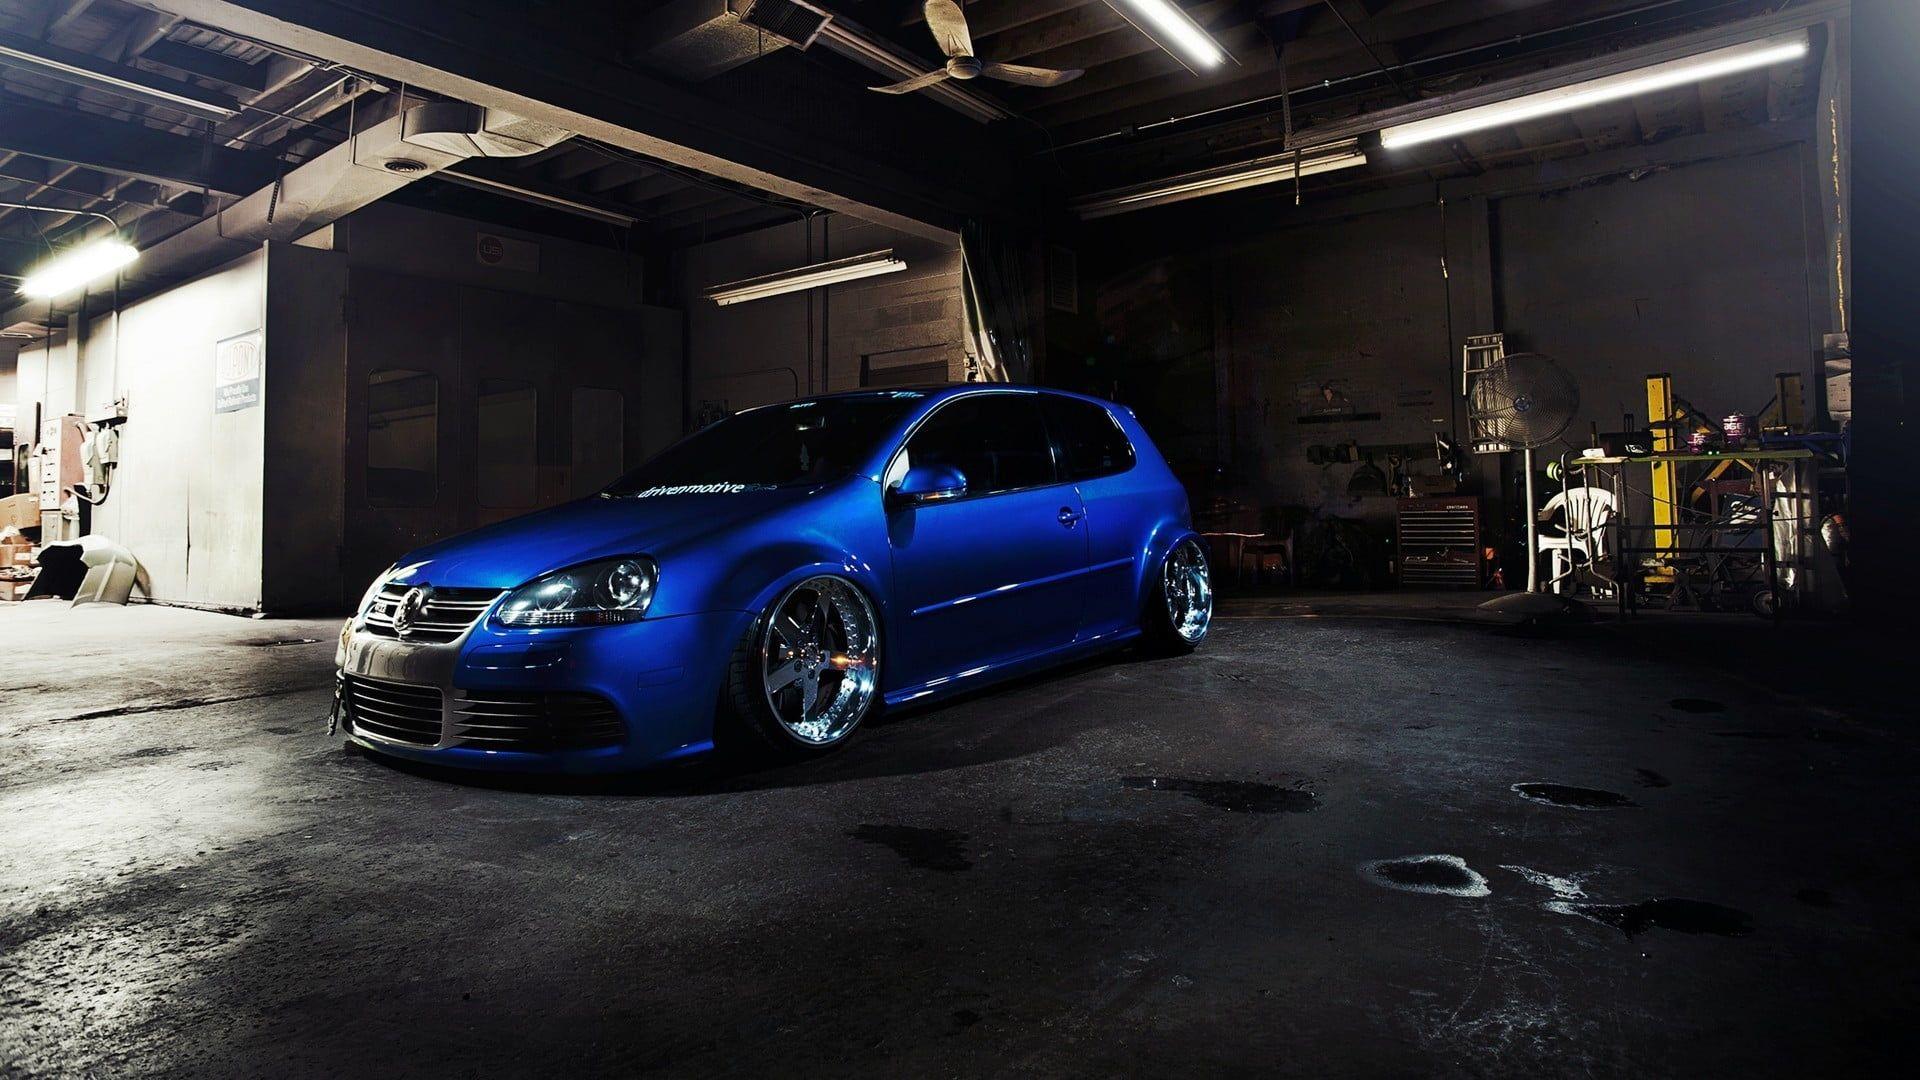 Stance Volkswagen Golf V Car Tuning Golf Gti R32 Blue Cars 1080p Wallpaper Hdwallpaper Desktop Volkswagen Golf Vw Beetle Turbo Volkswagen